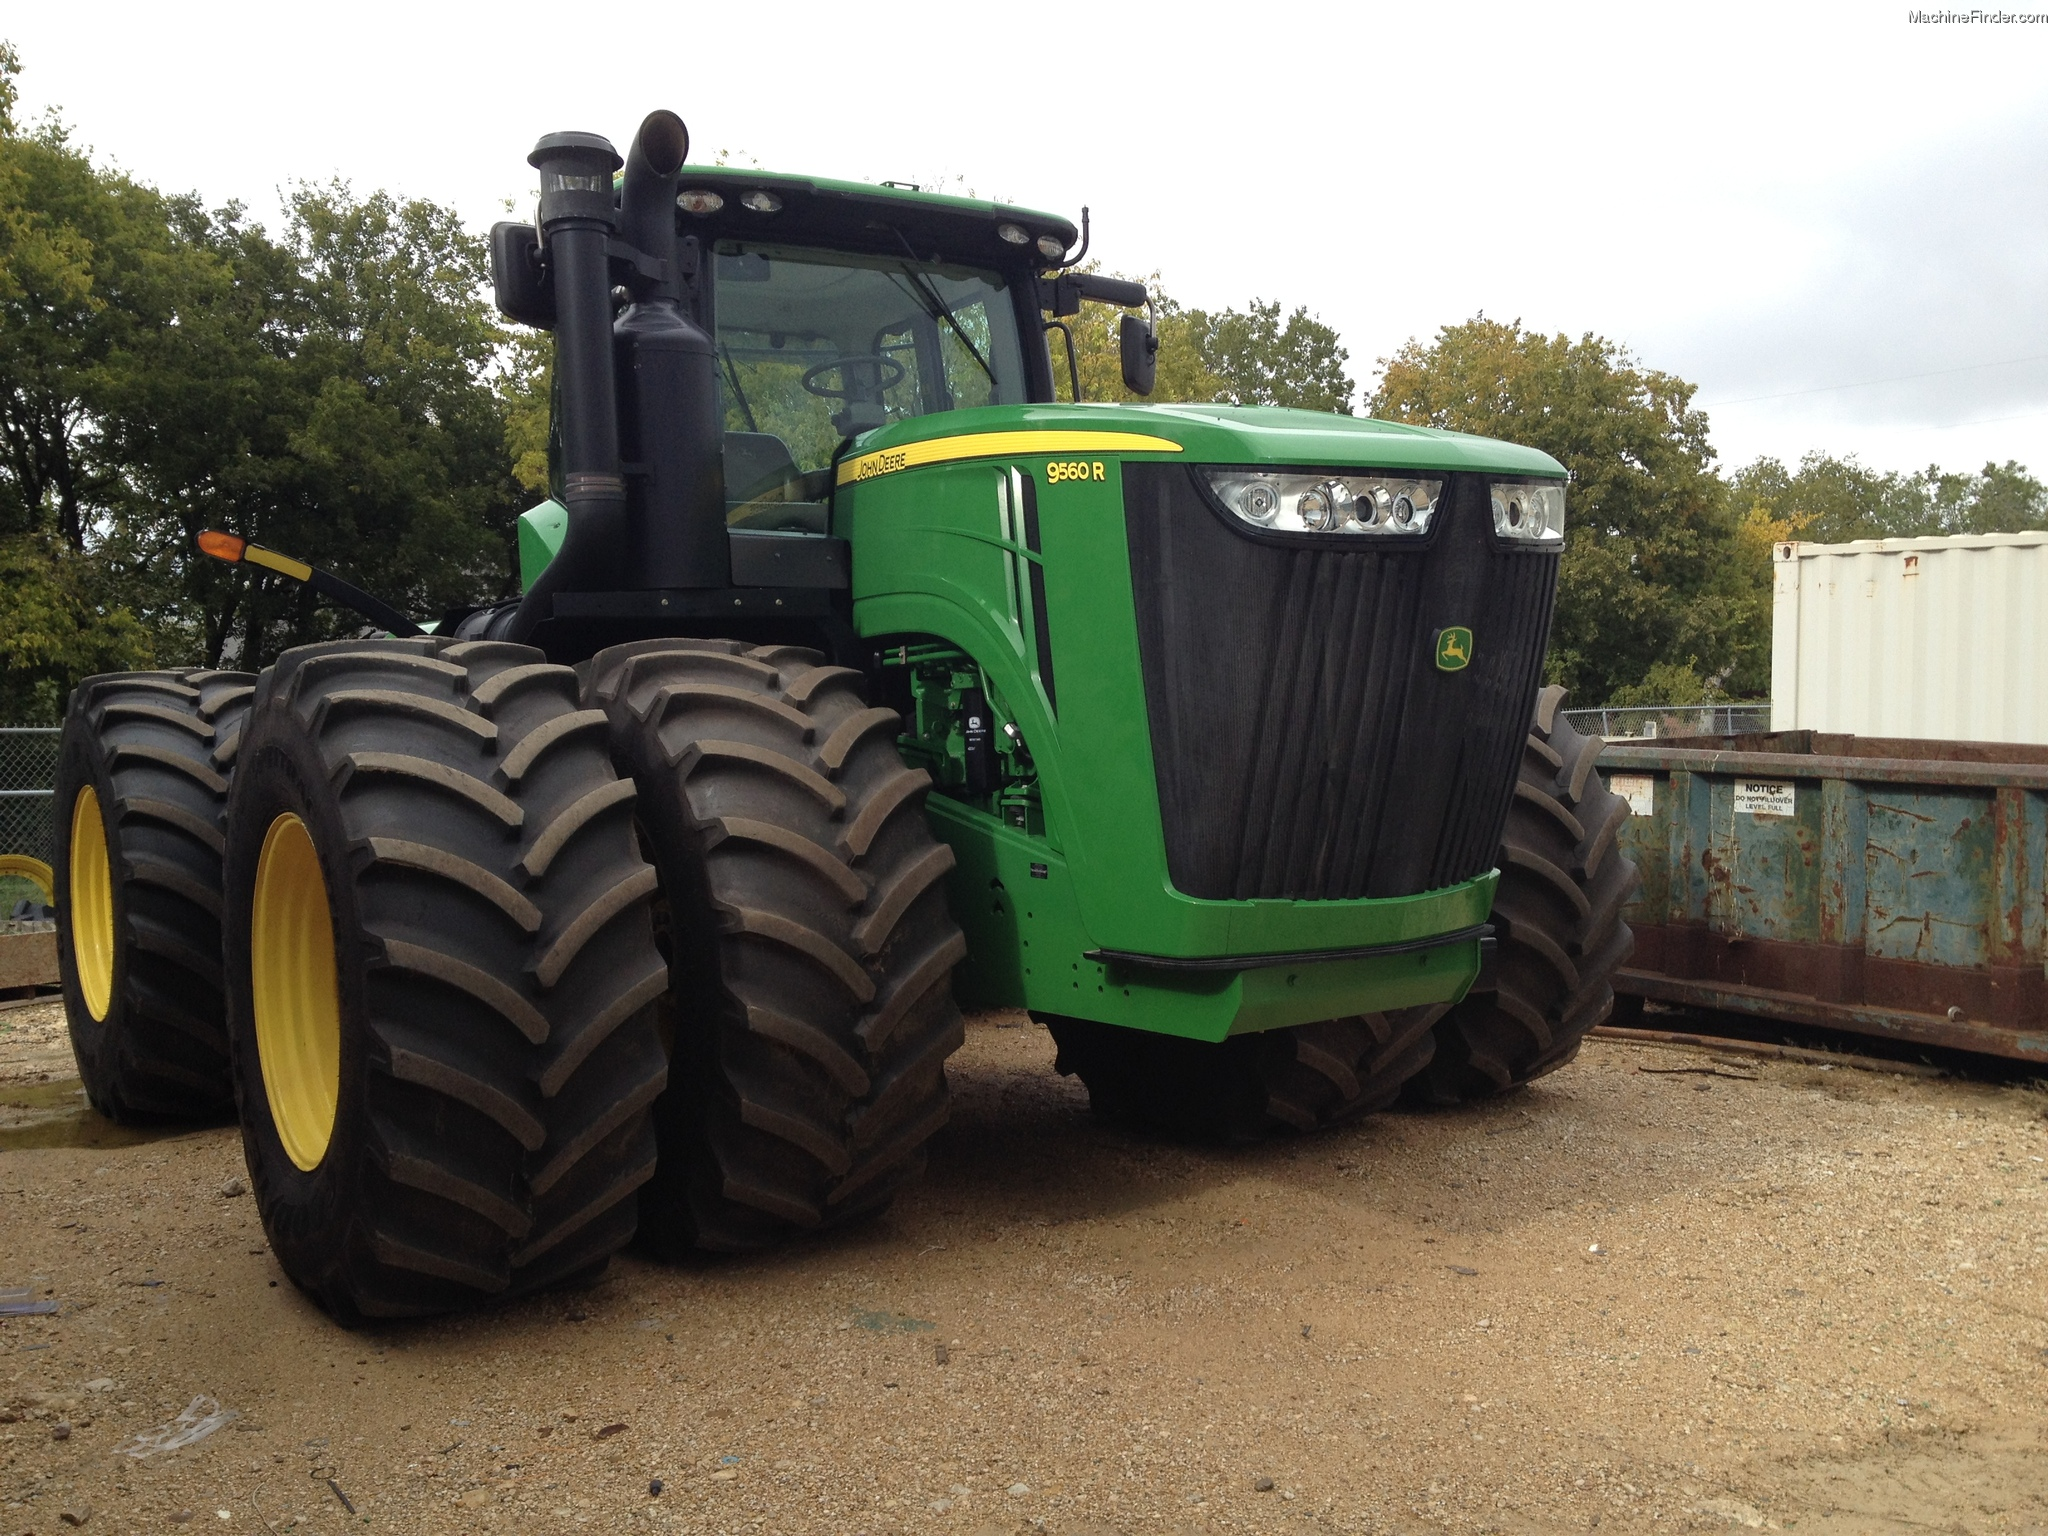 2012 John Deere 9560R Tractors - Articulated 4WD - John ...